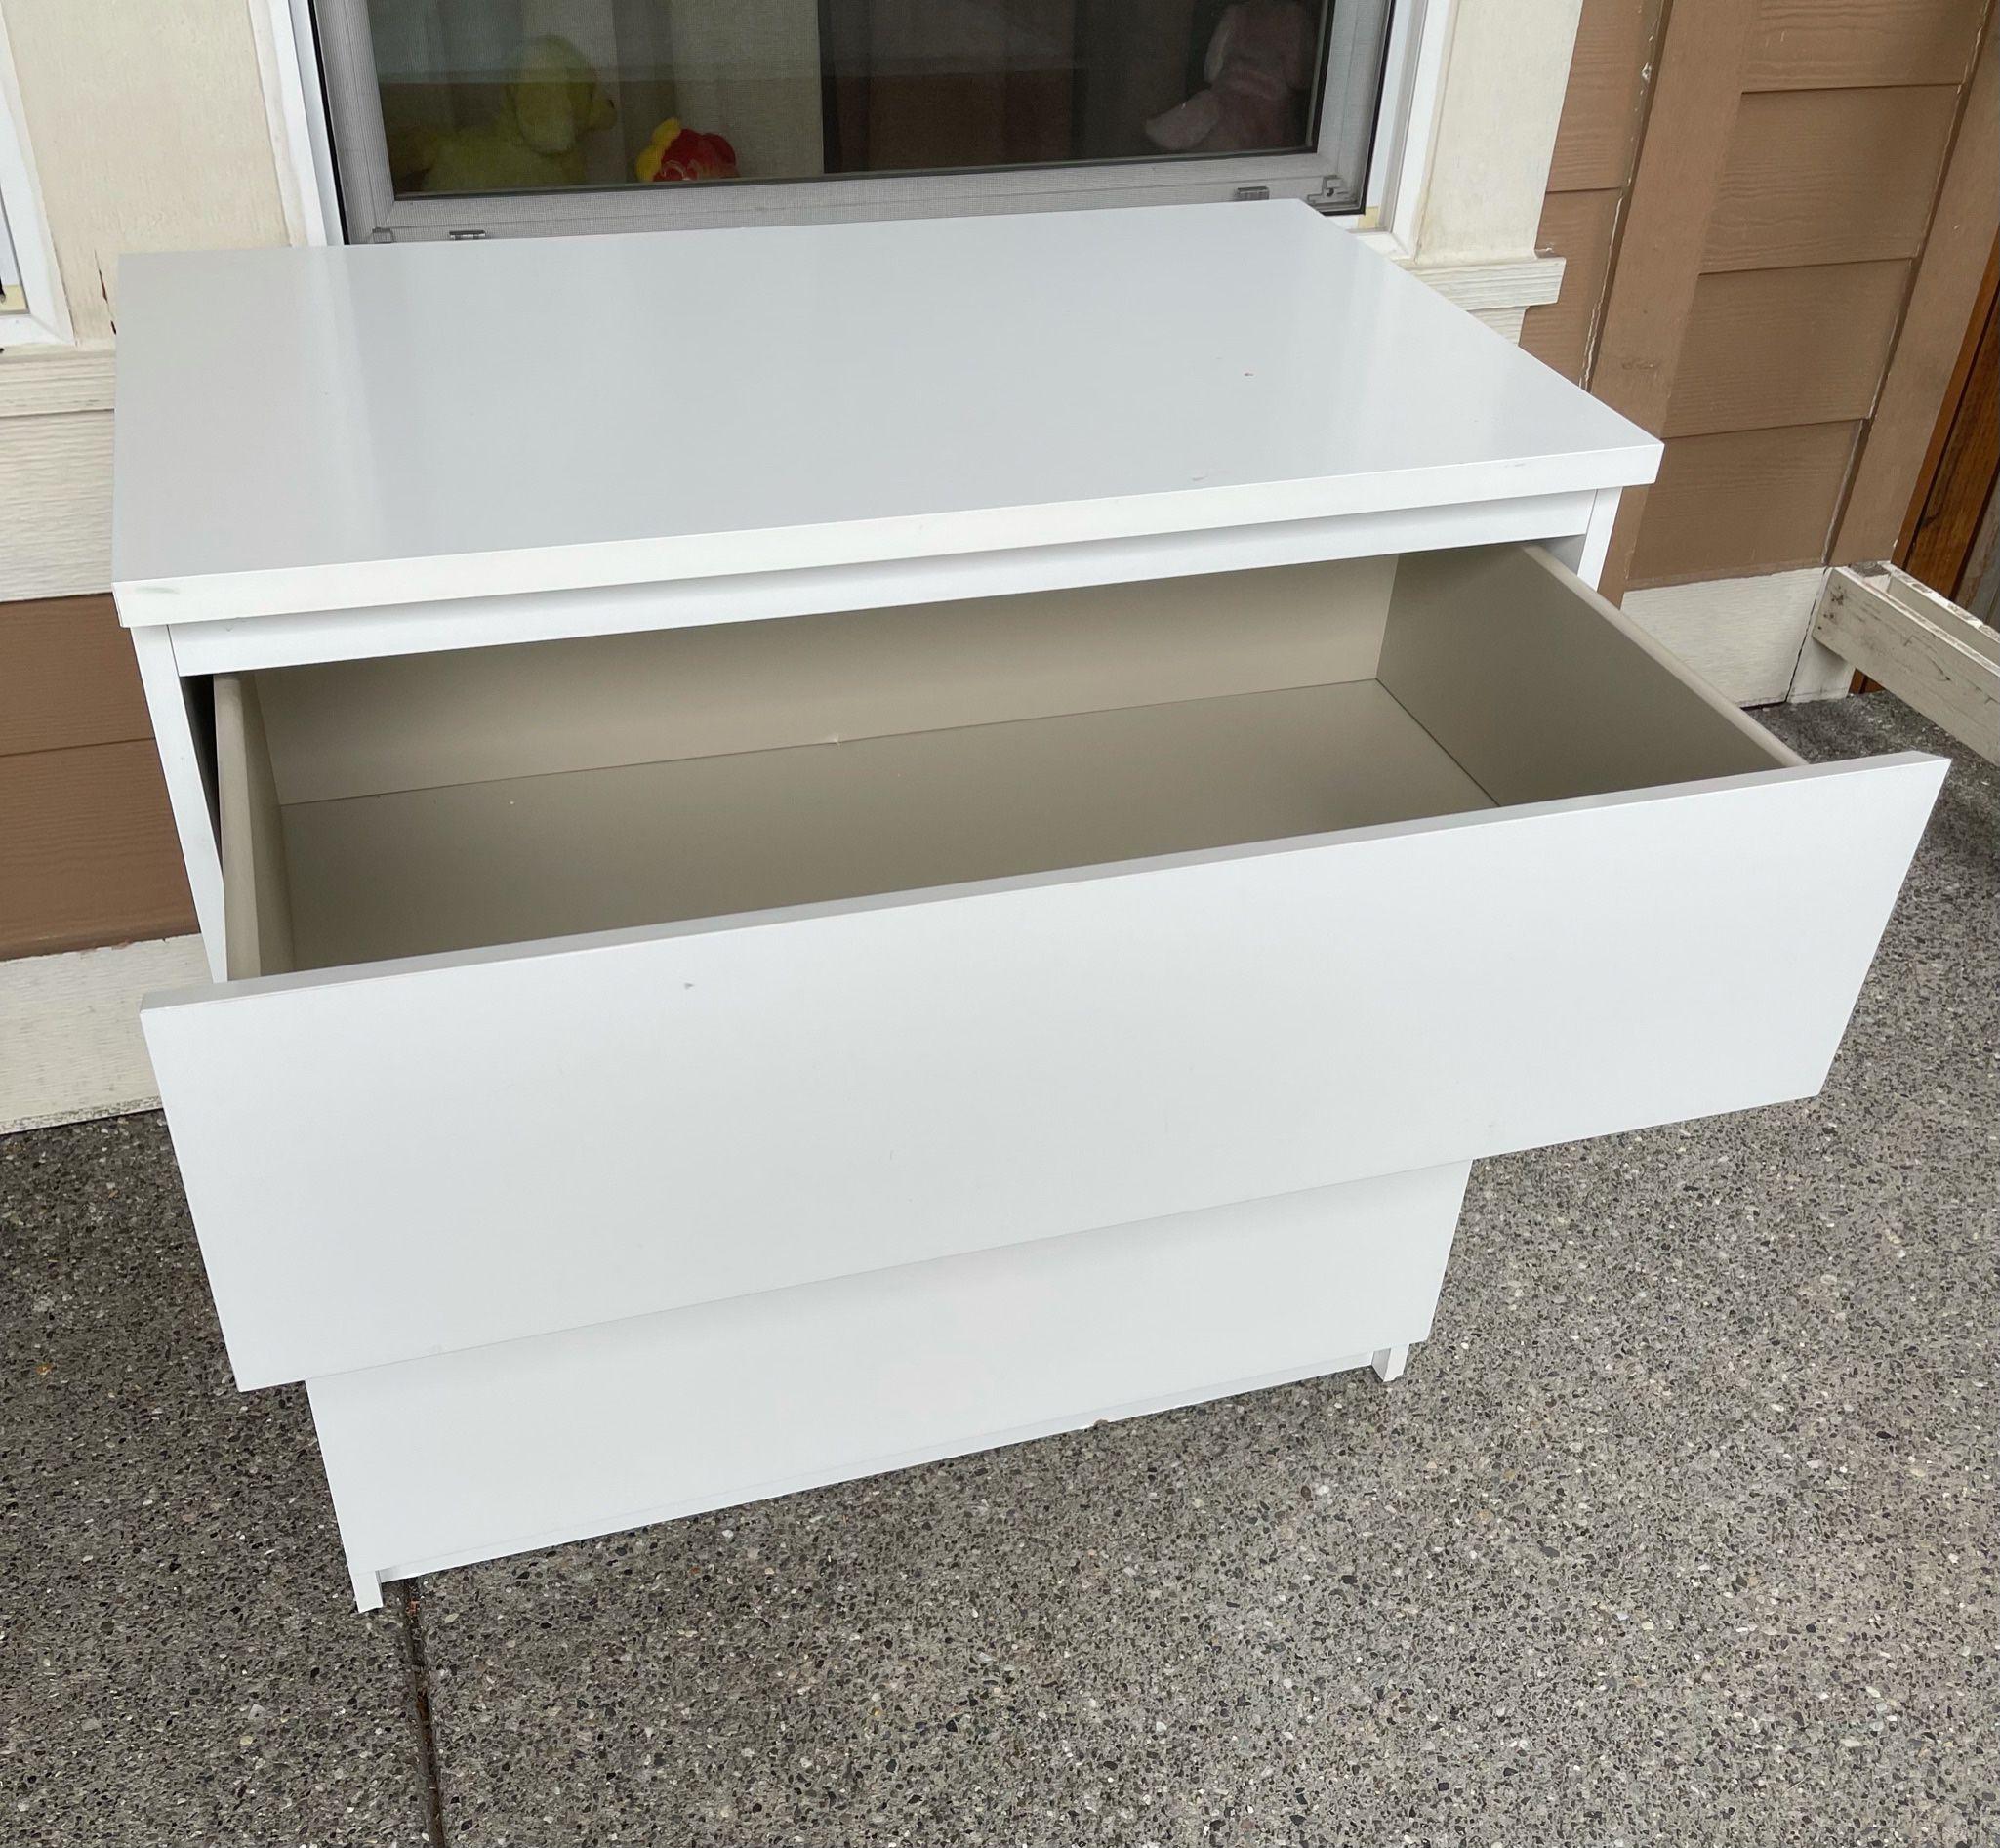 Ikea MALM 3 drawers chest glossy white dresser